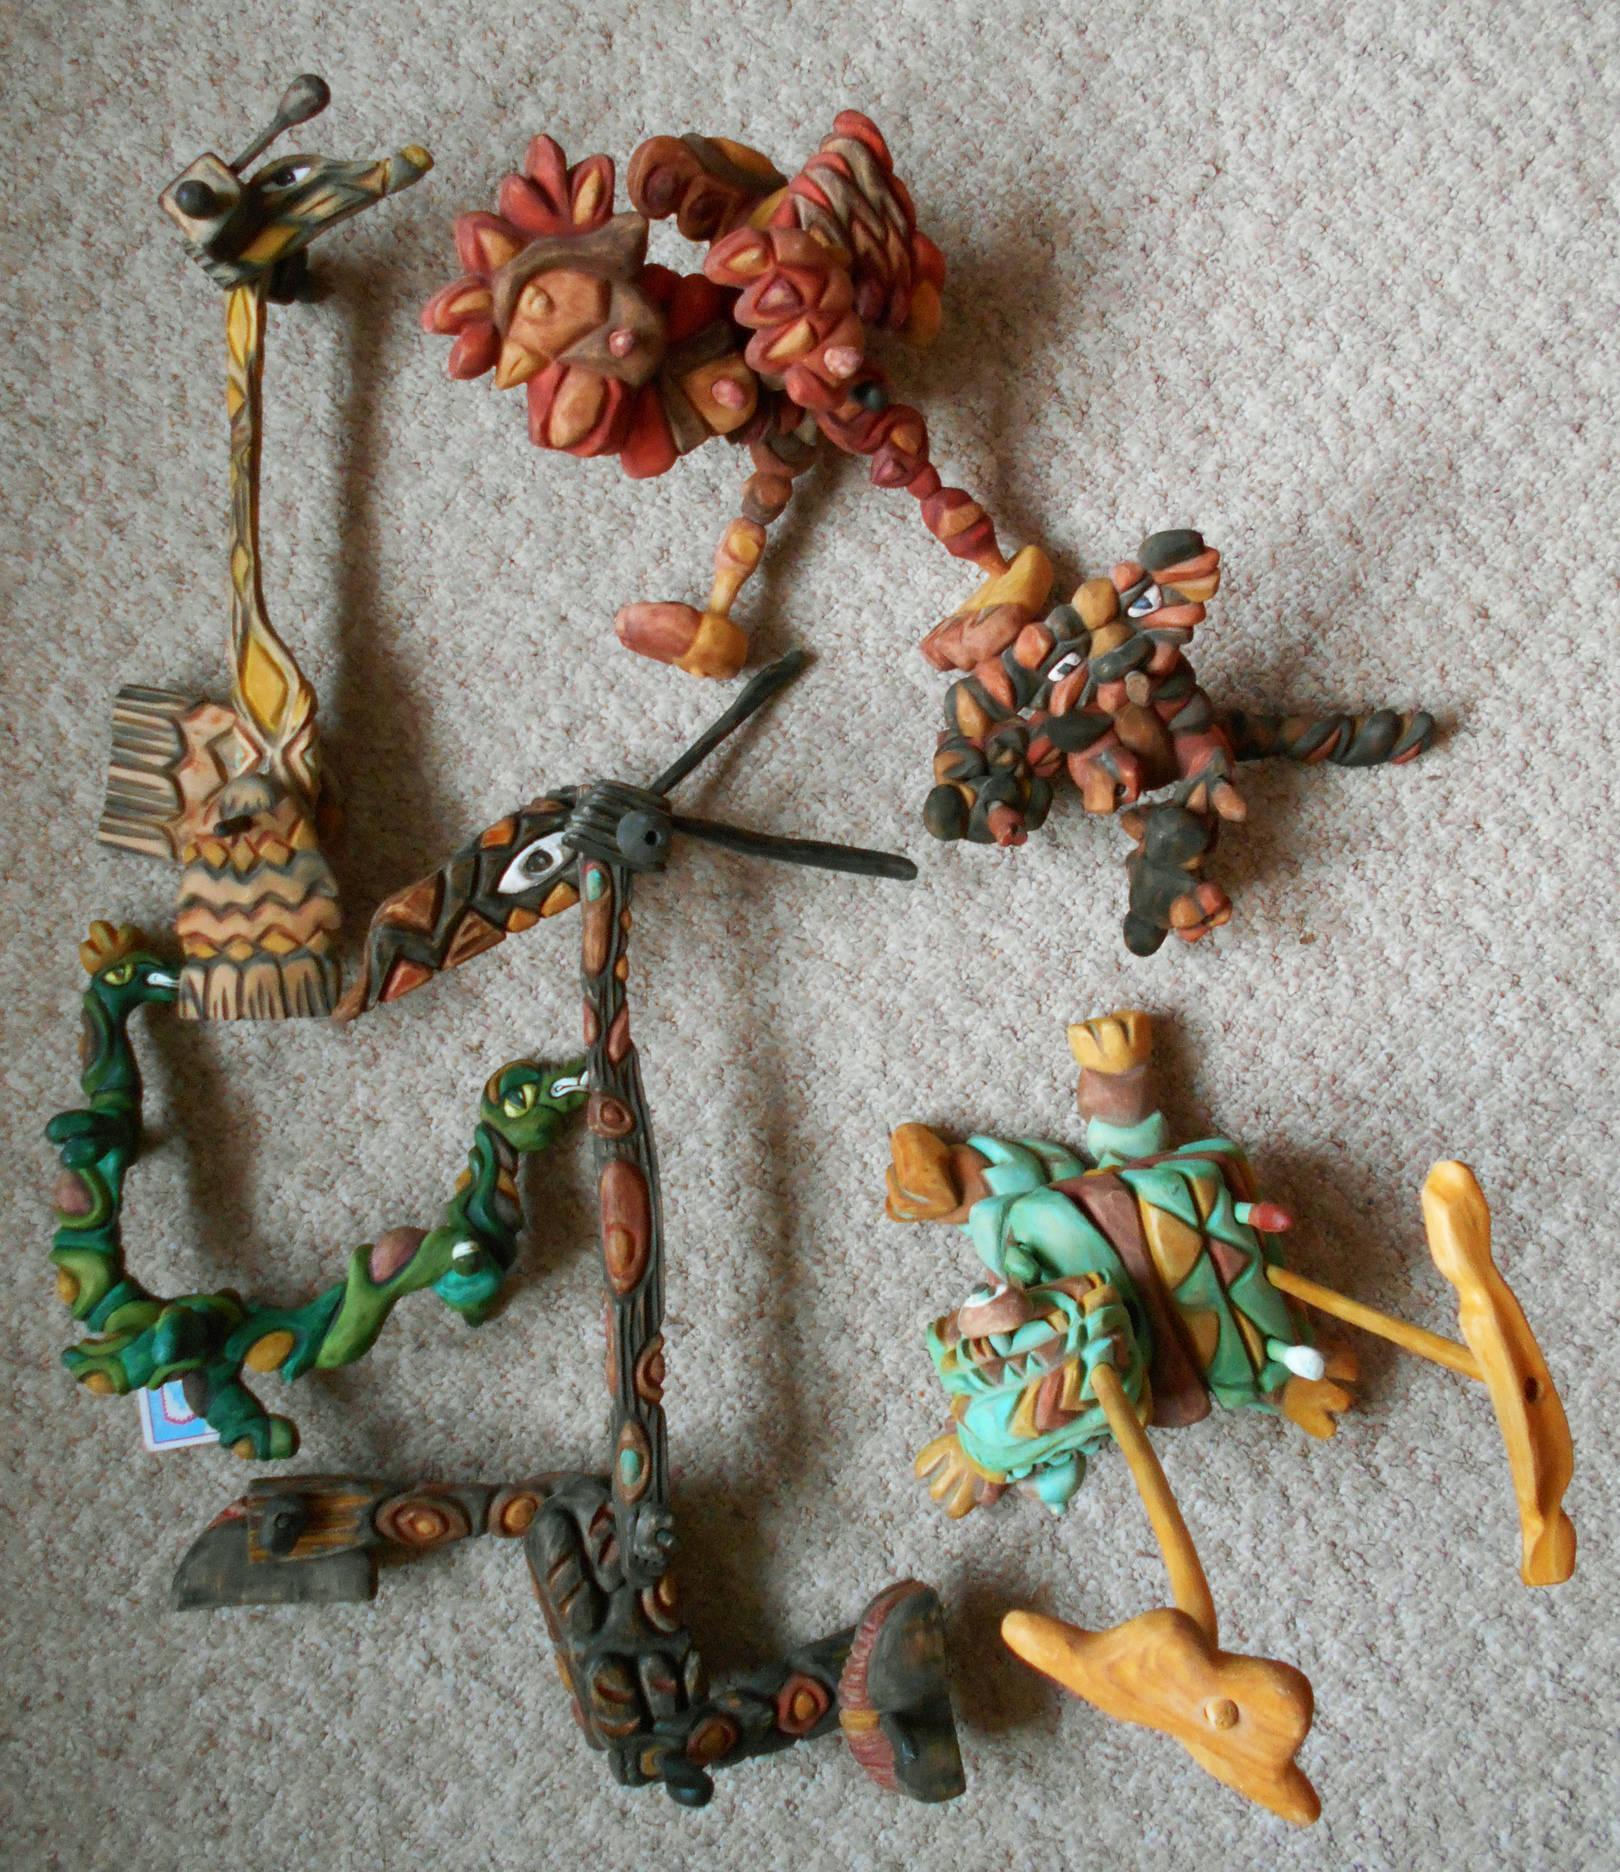 Жирафы, змеи, черепаха, петух и собака